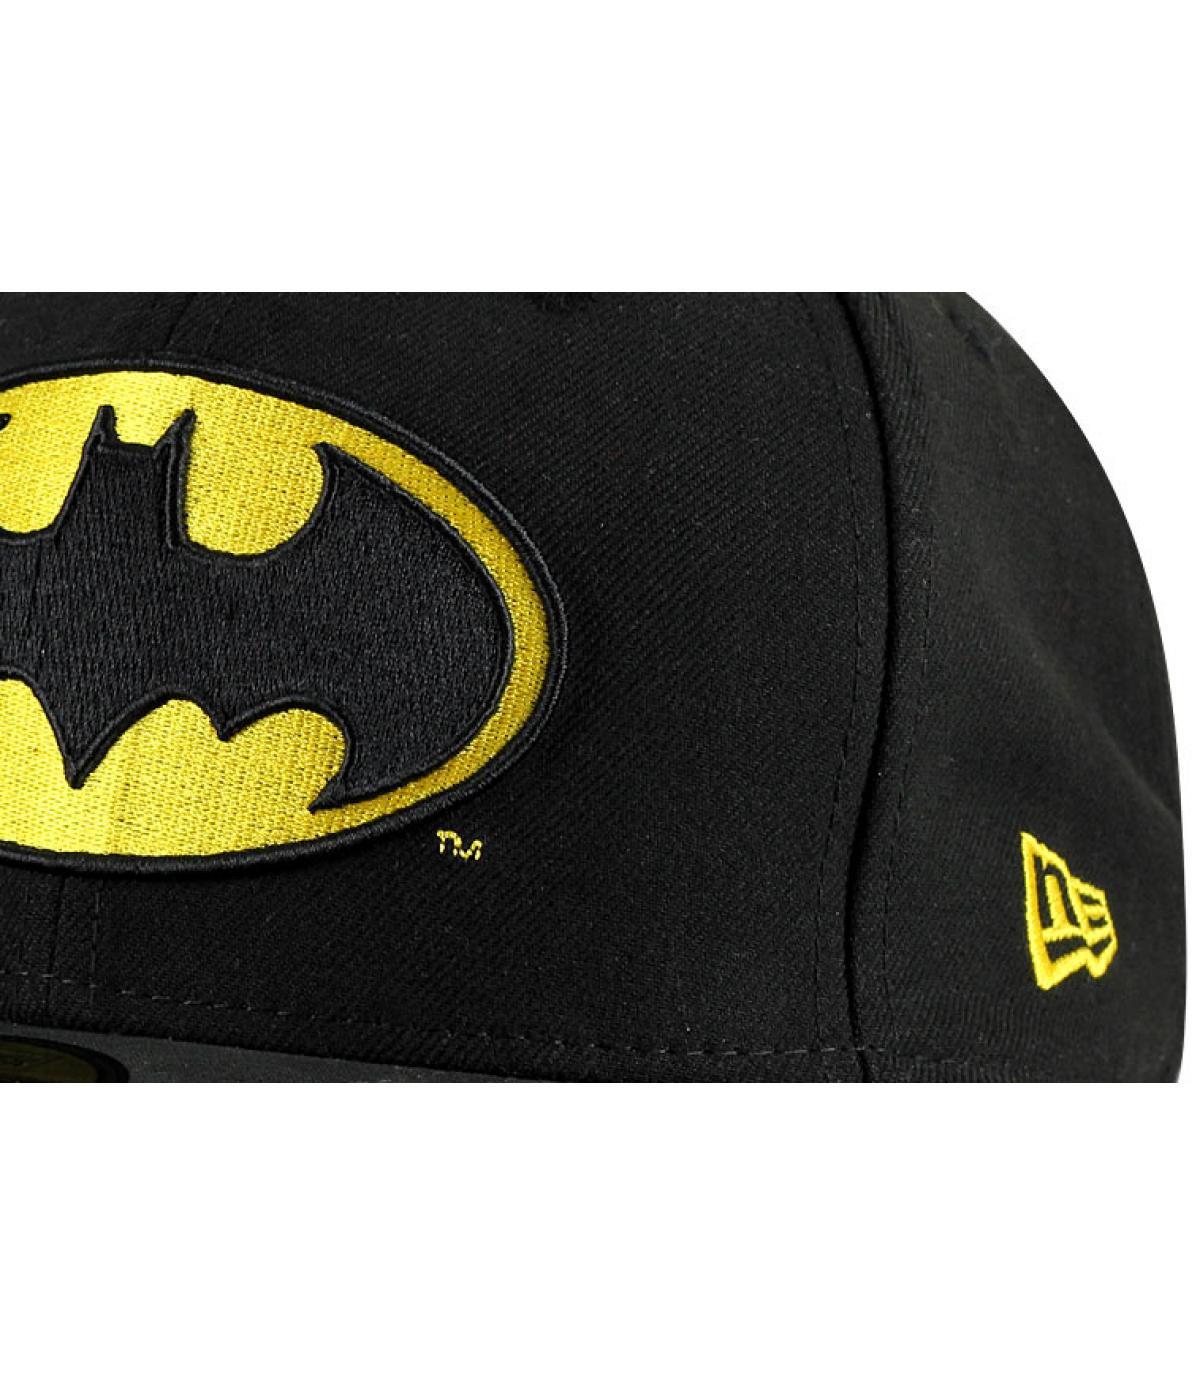 ... Détails 59fifty visor story Batman - image ... 6ed056e3a27